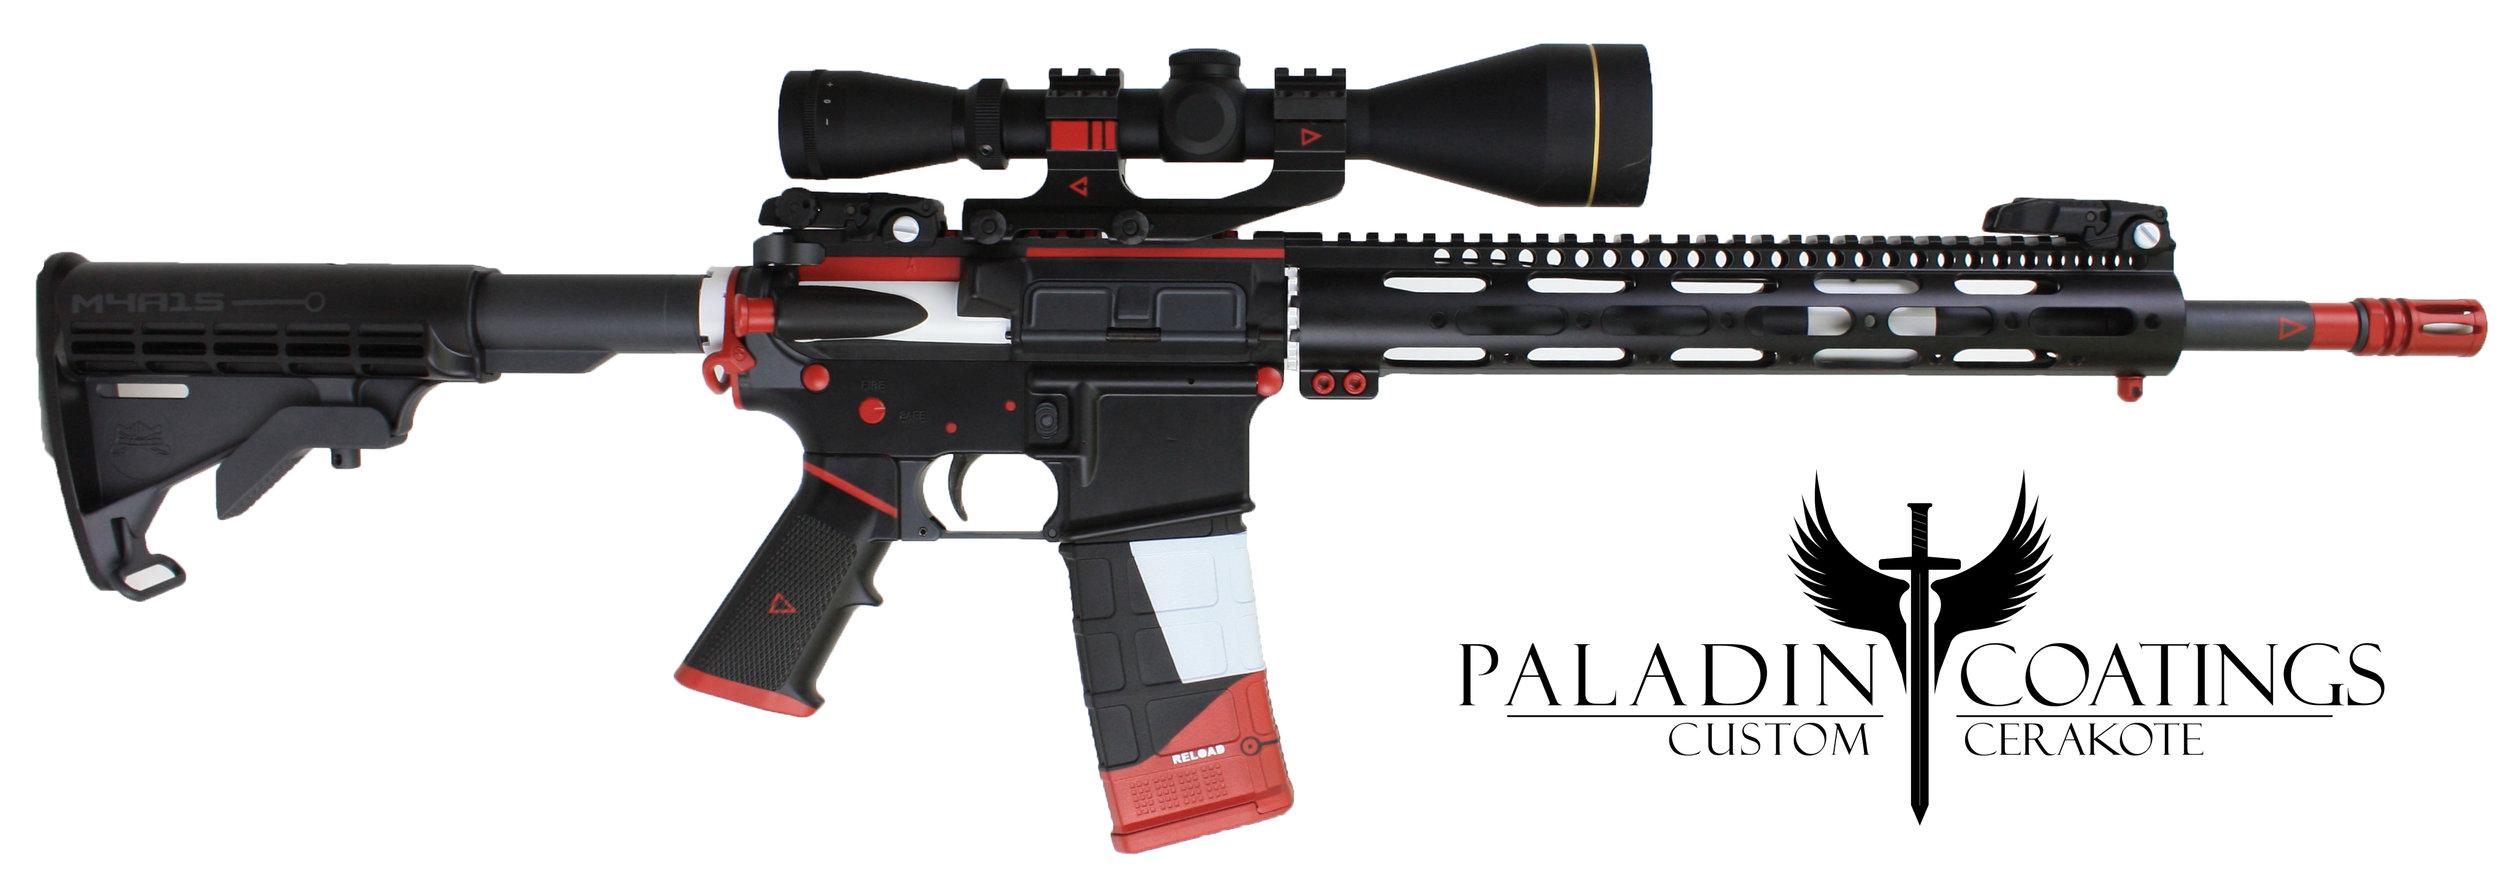 M4a1 S Cyrex Paladin Coatings